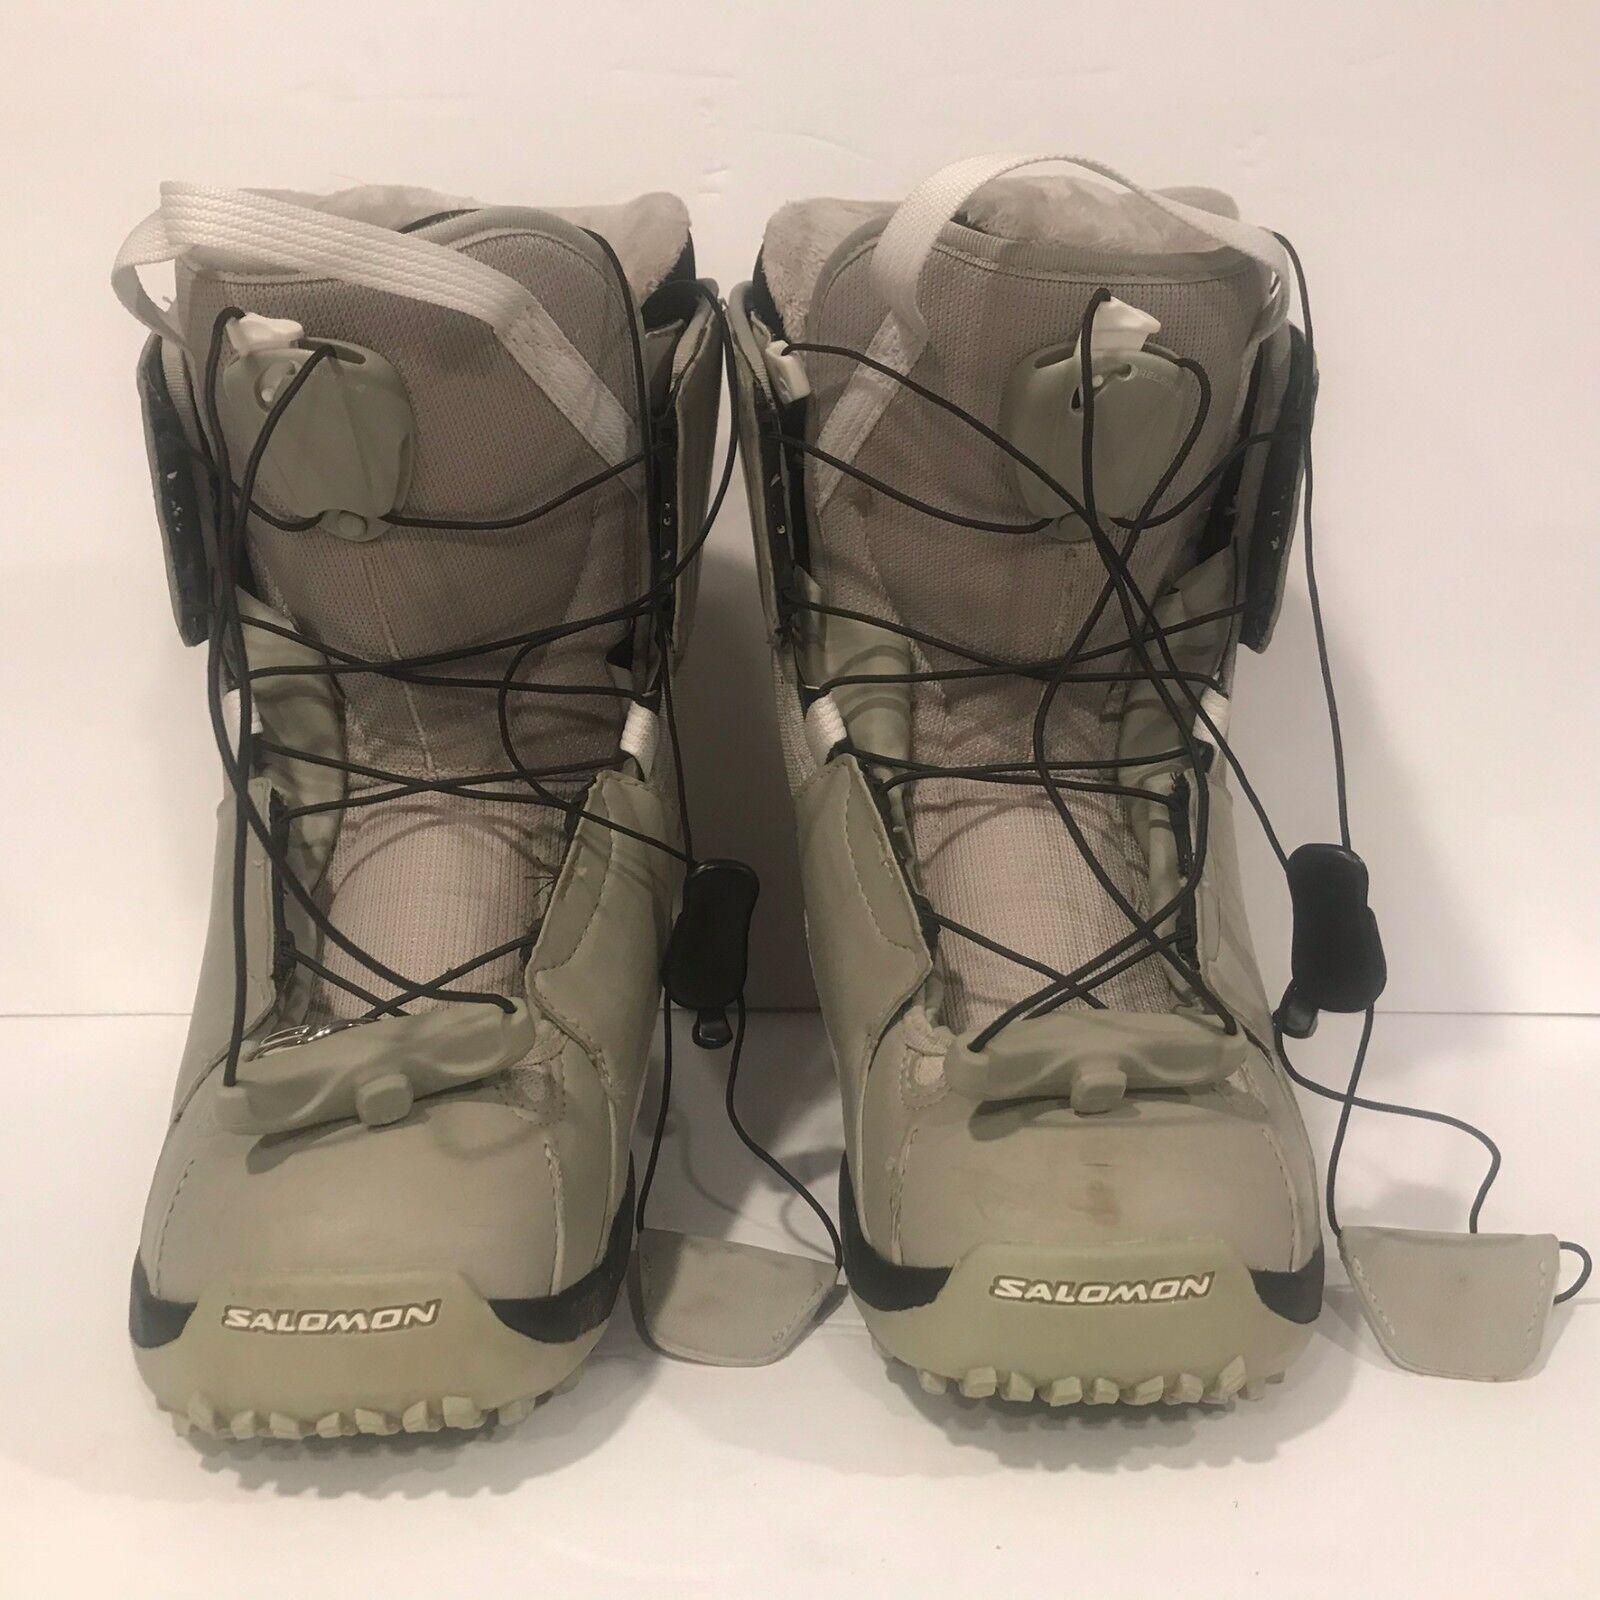 Salomon Halitan AutoFit Snowboard Boots Women's Light Green Size 6